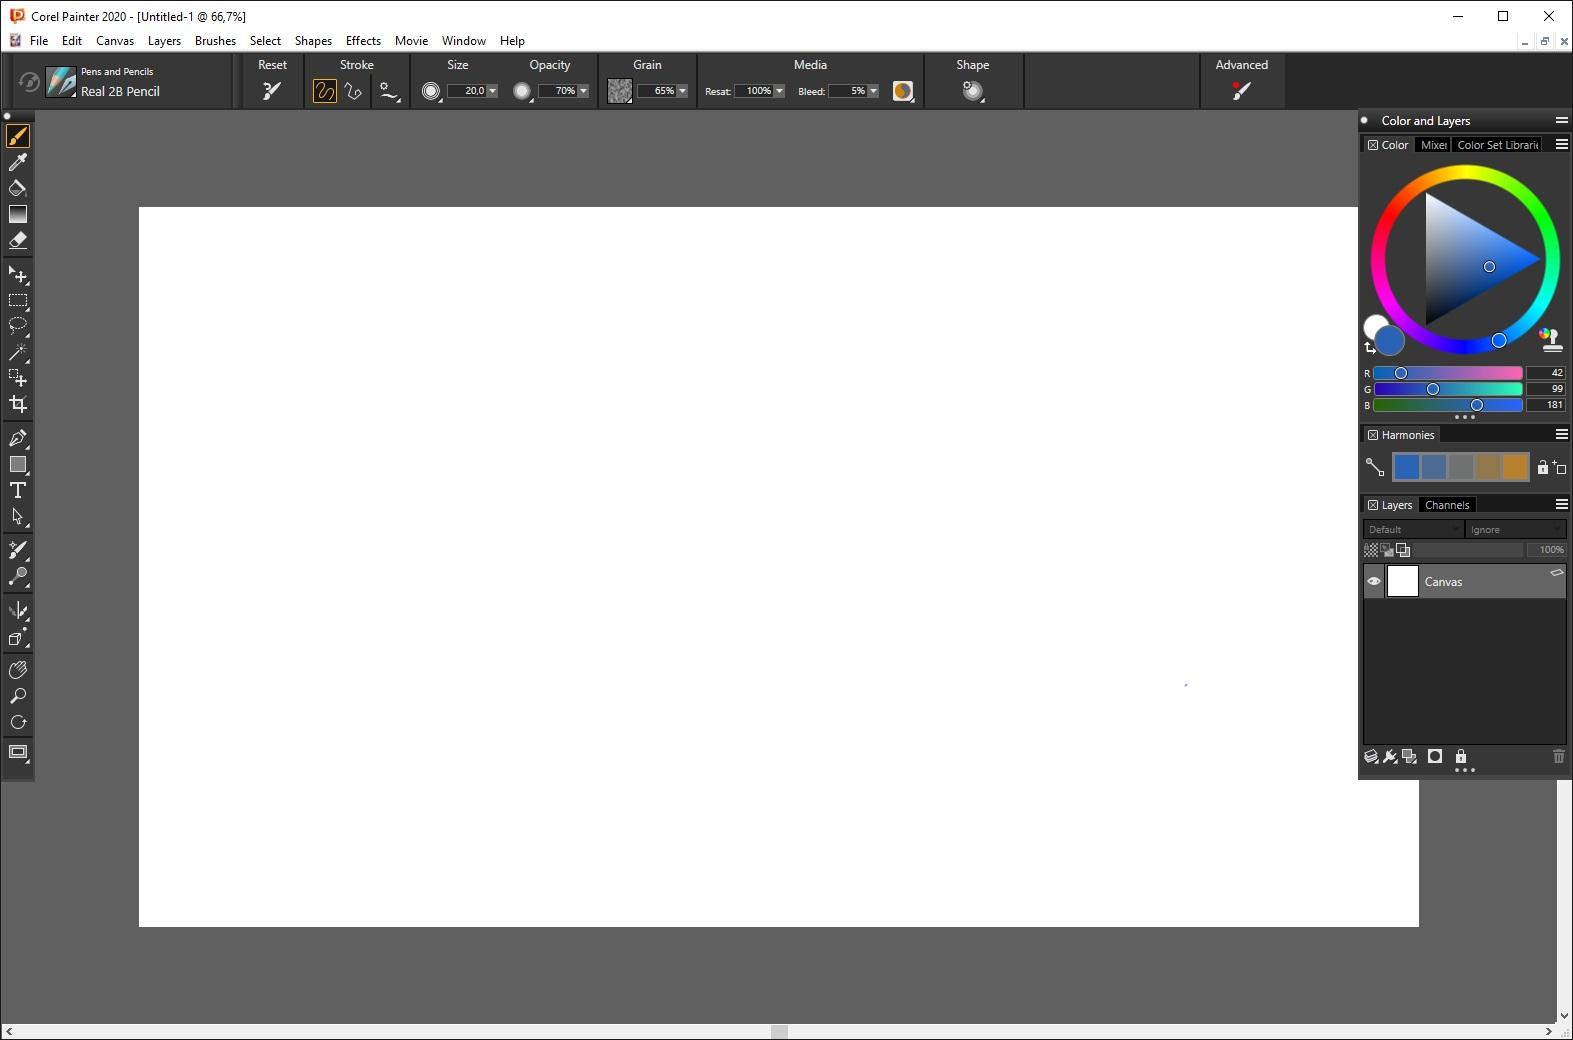 Corel Painter 2020 v20.1.0.285 x64 - ENG